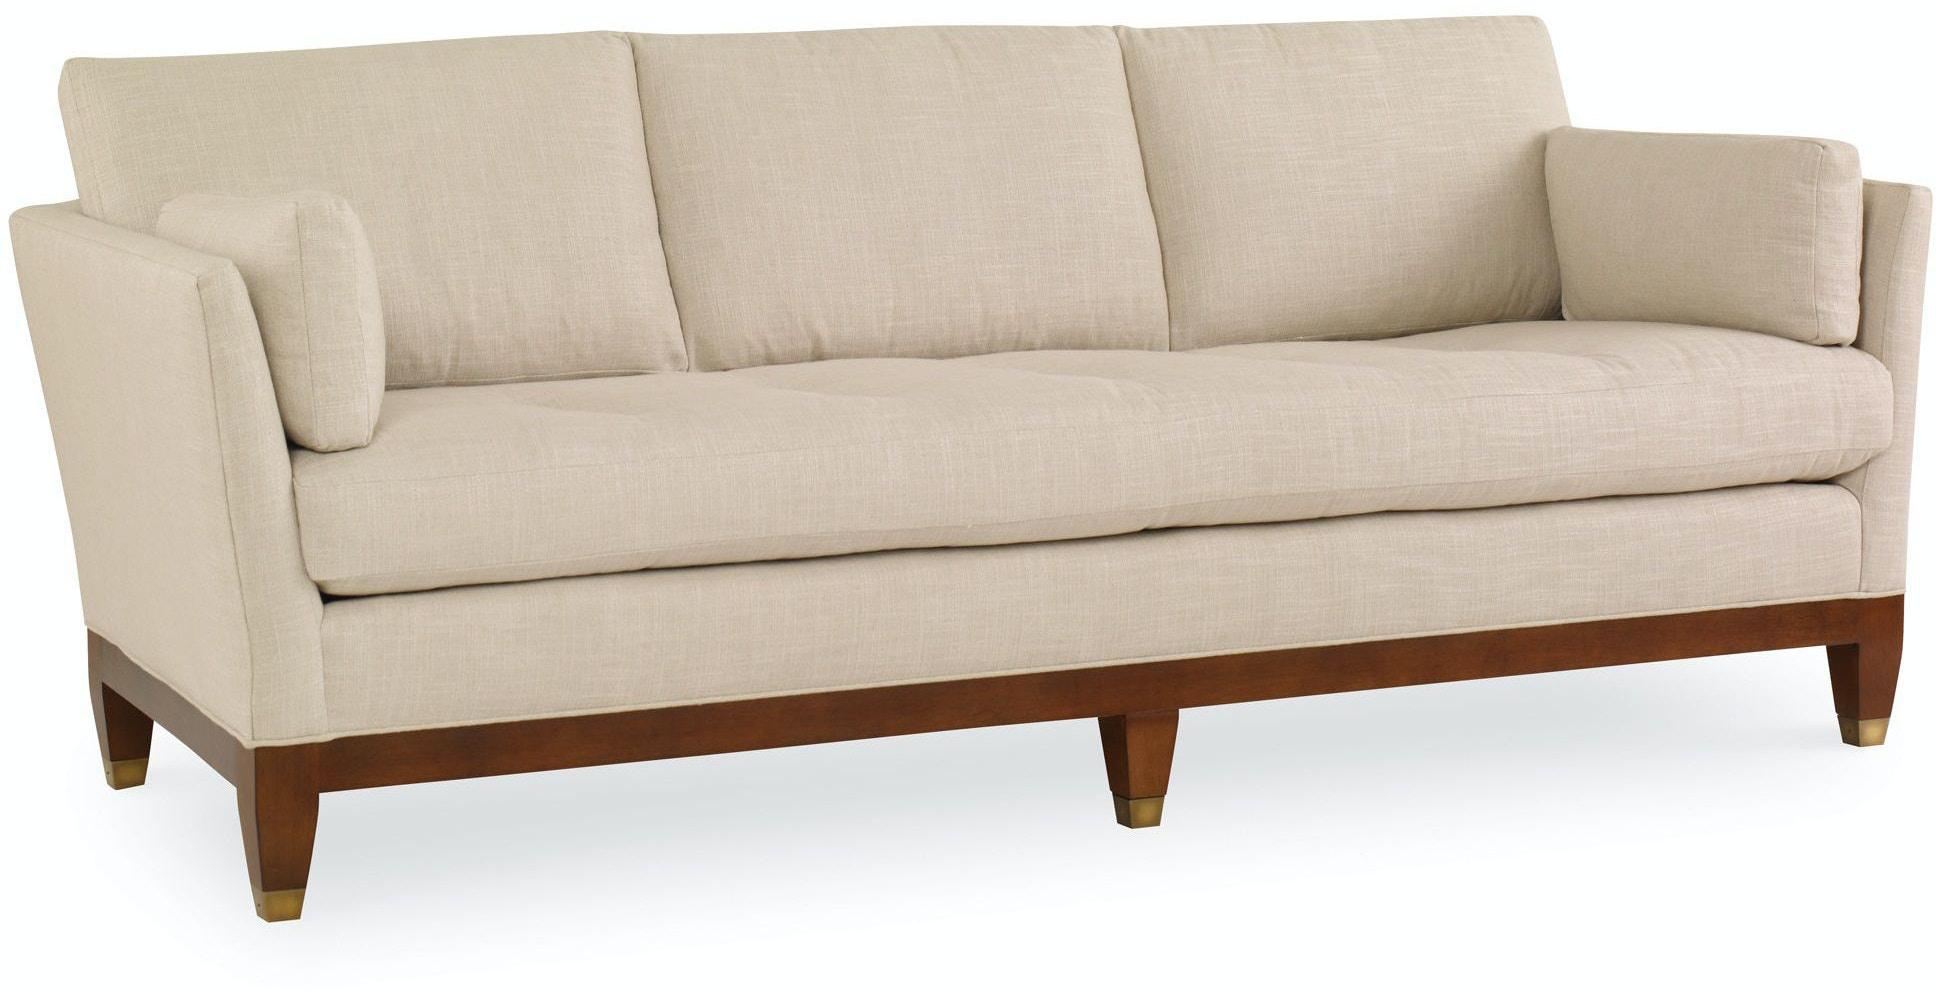 Sofas Furniture Lee Jofa New New York NY